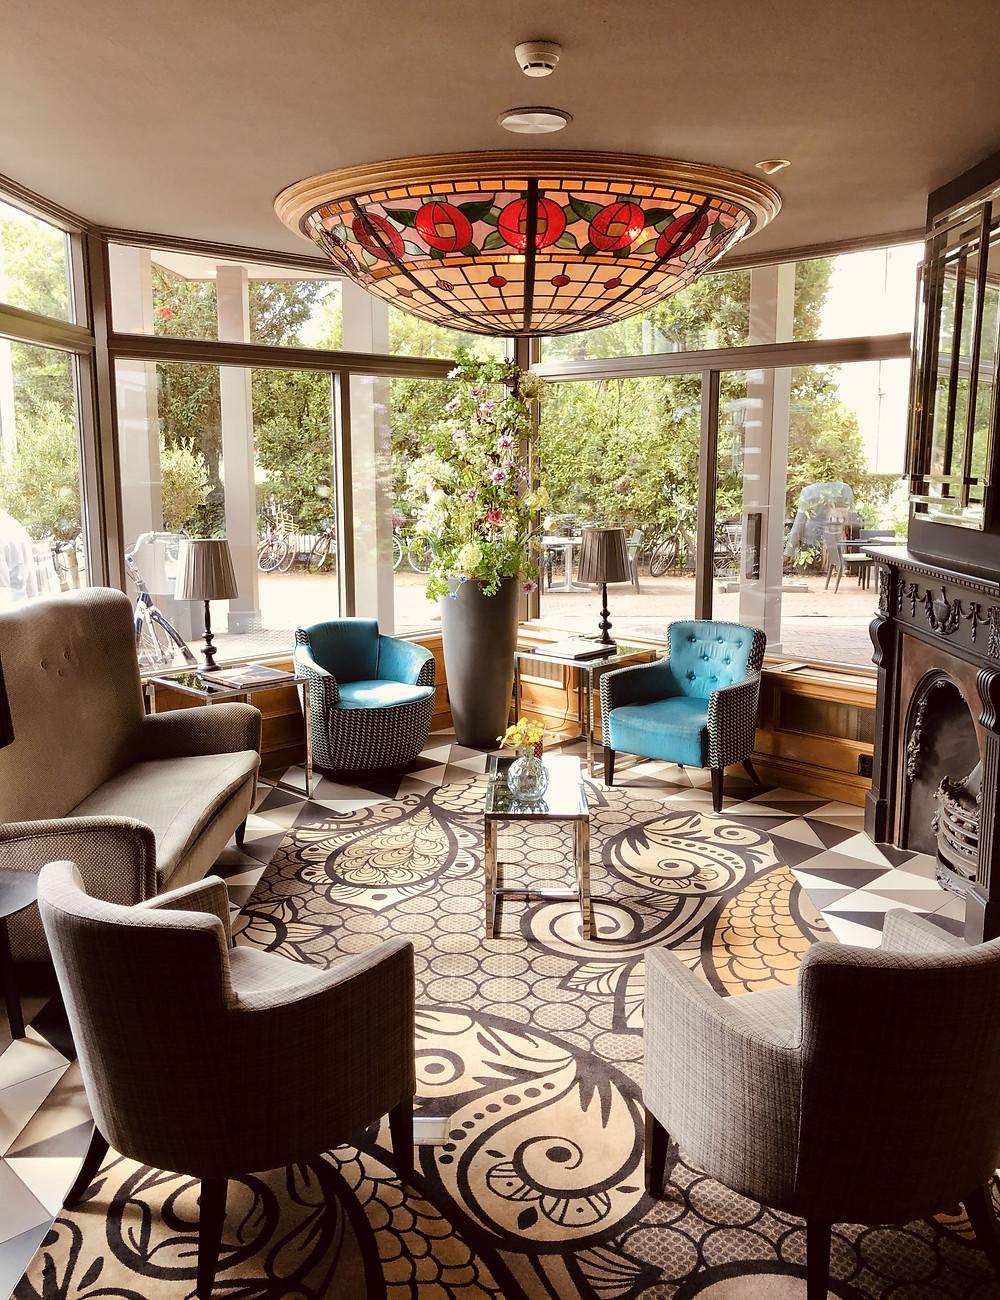 Carlton Square Hotel lobby Haarlem - The Netherlands